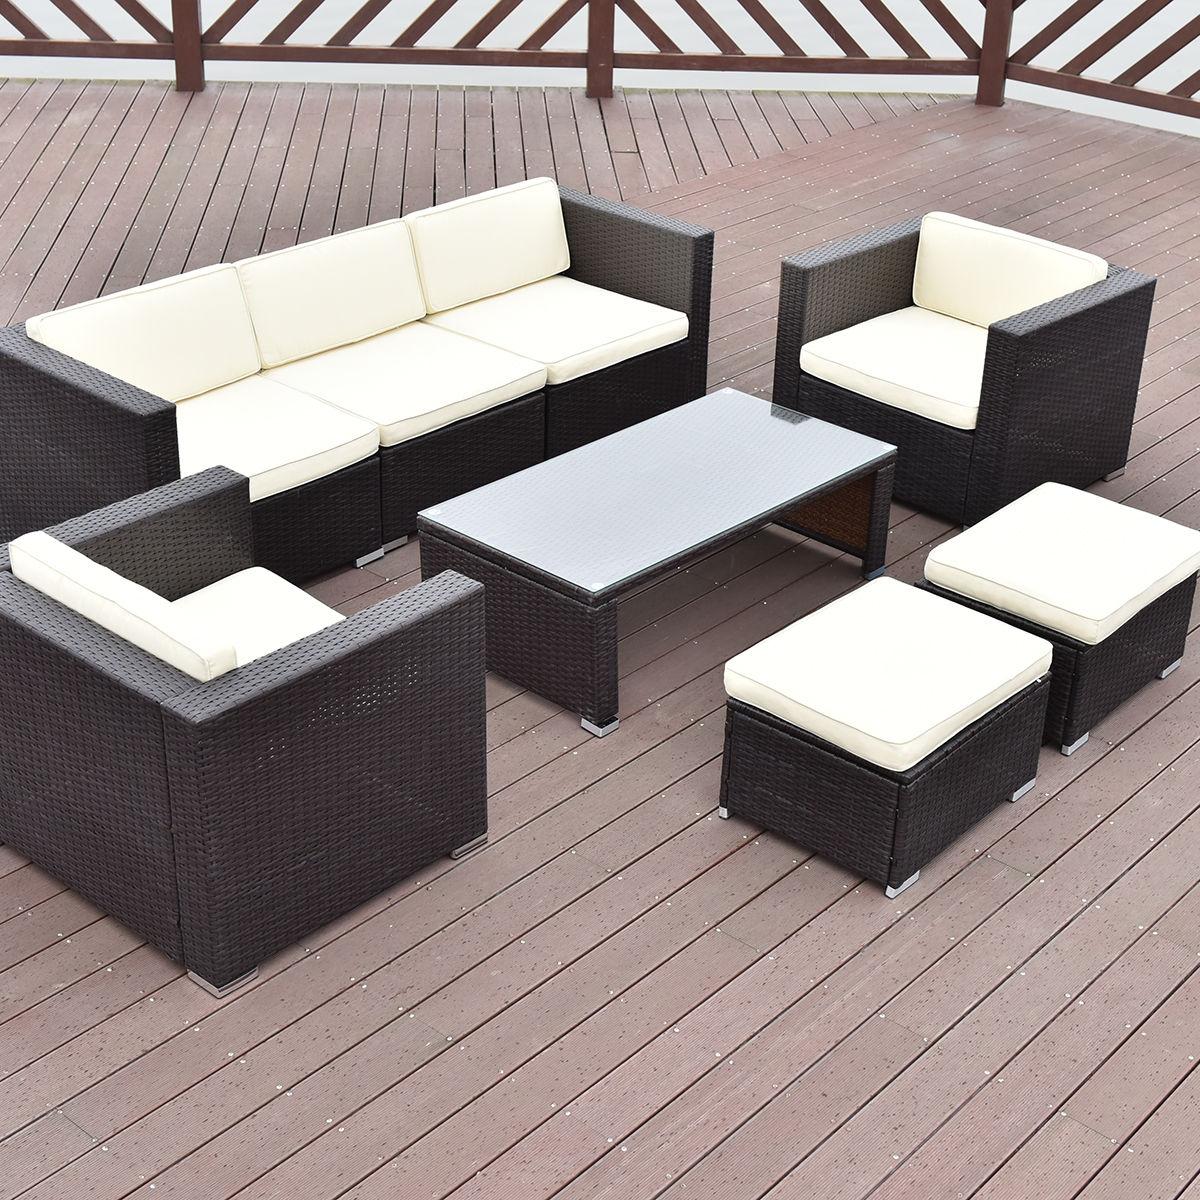 8 pcs Outdoor Patio Rattan Wicker Cushioned Furniture Set